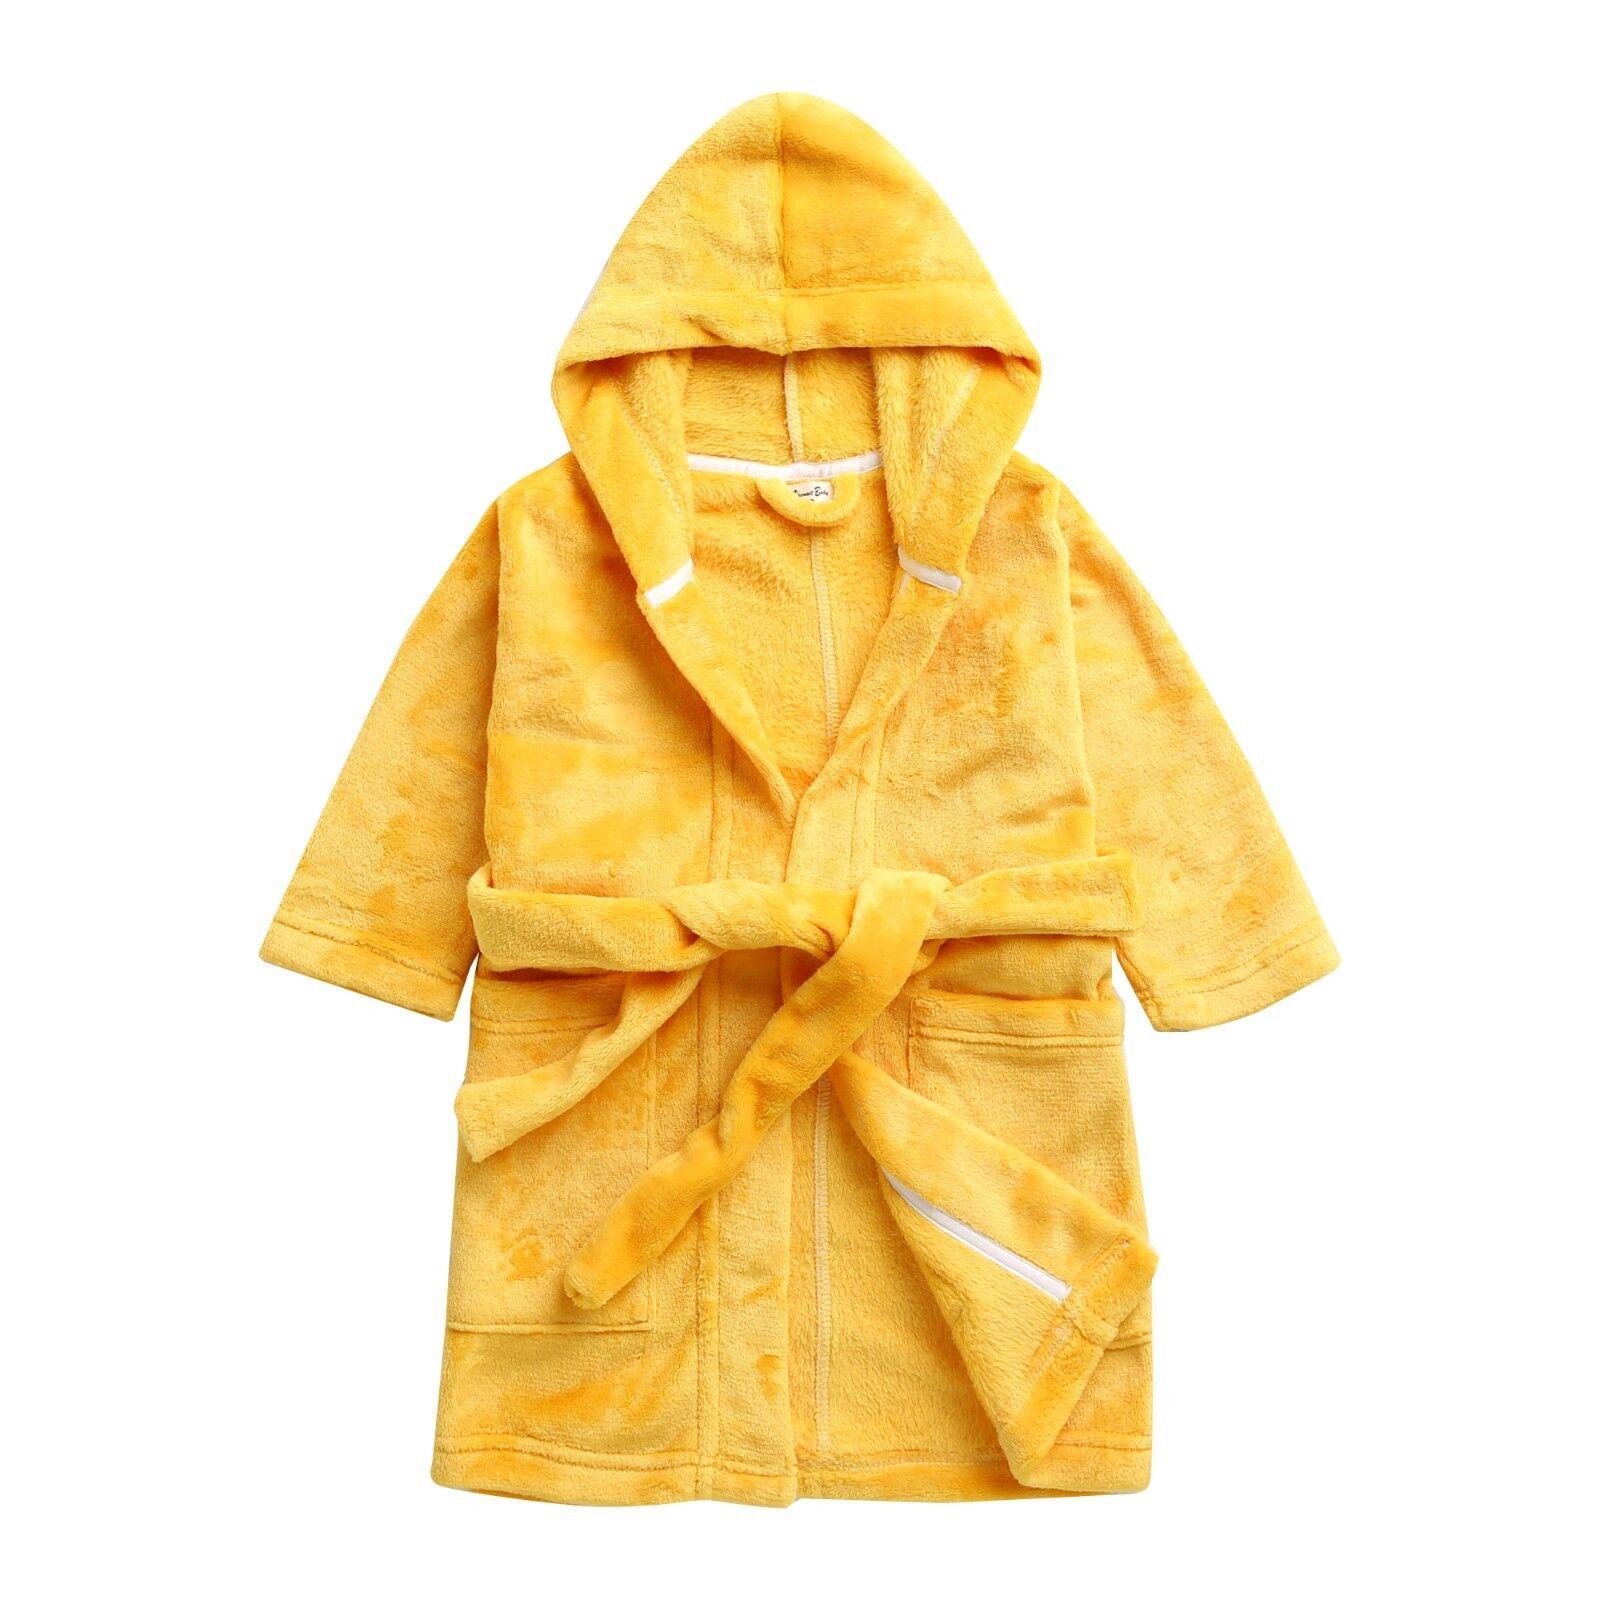 Vaenait Baby Kids Soft Plush Hooded Bathrobes Dressing Gown